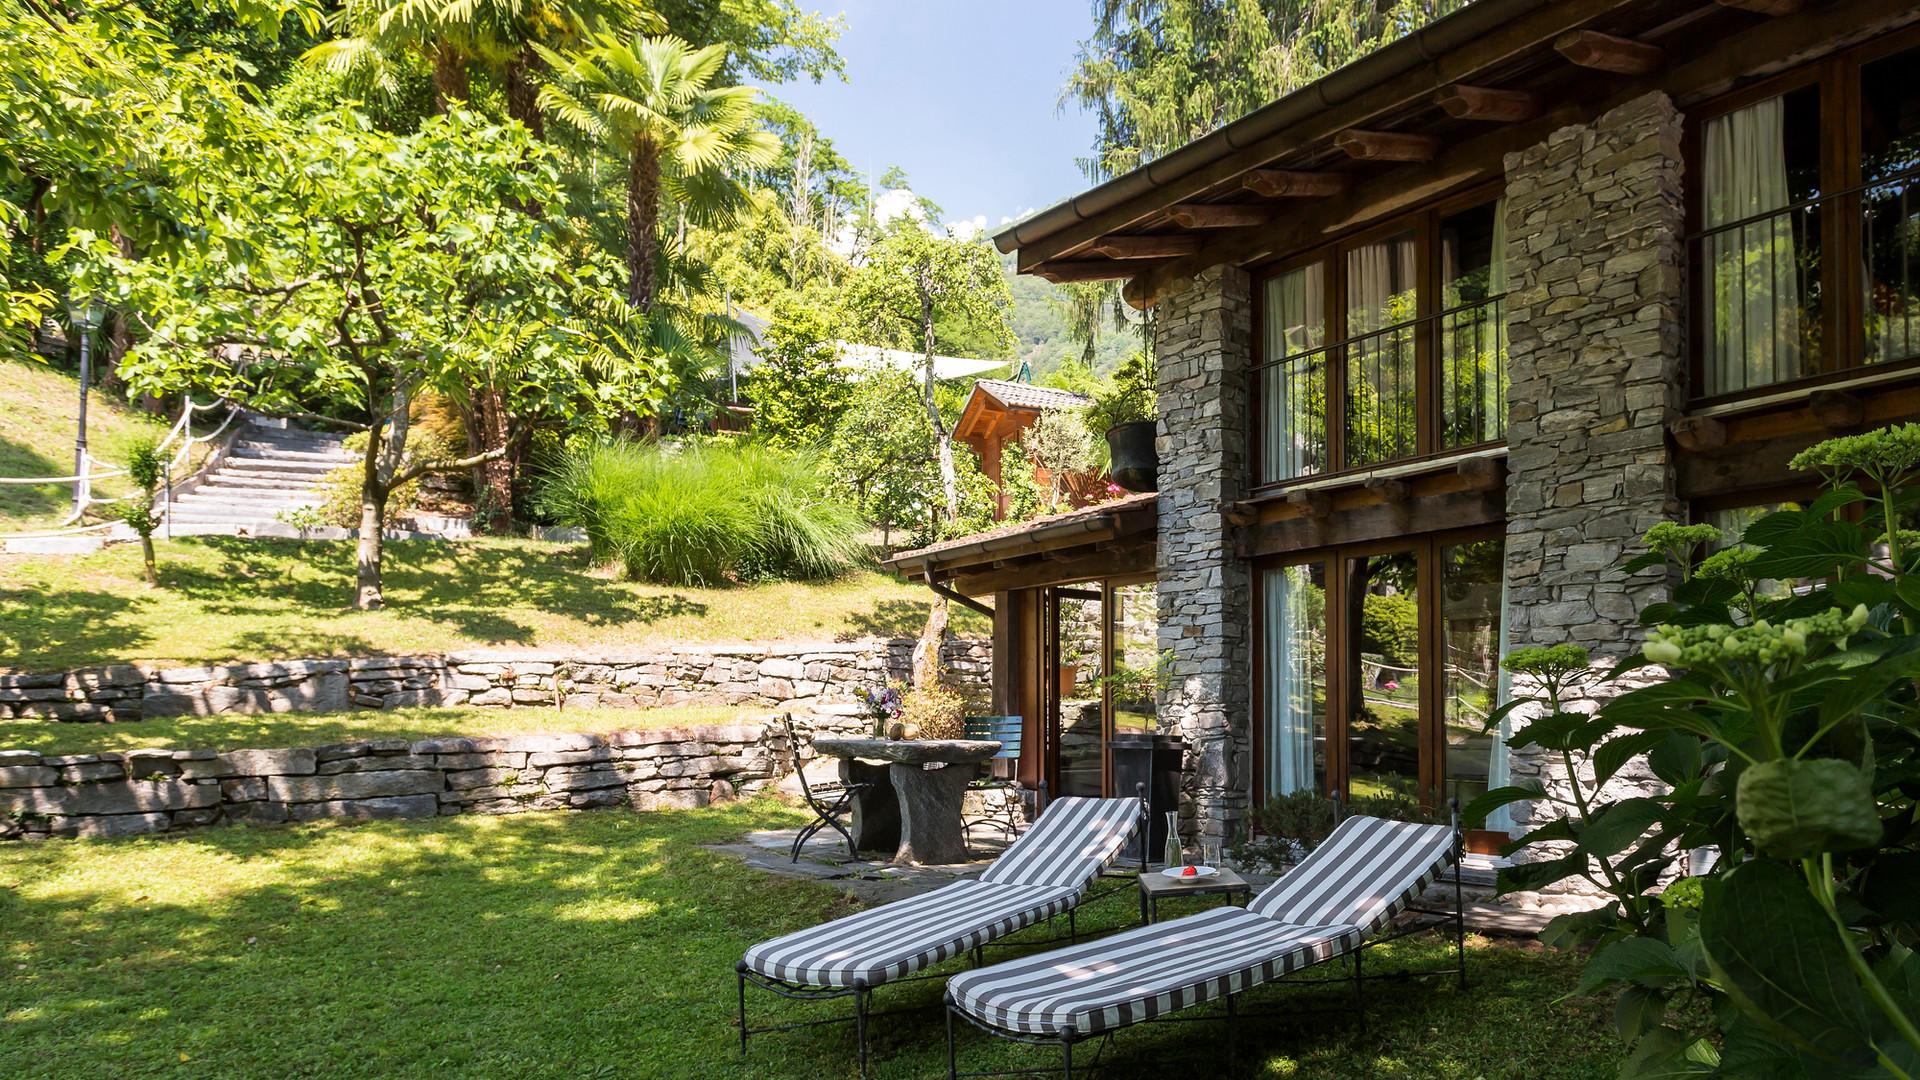 Rustico 2, deck chair in the garden